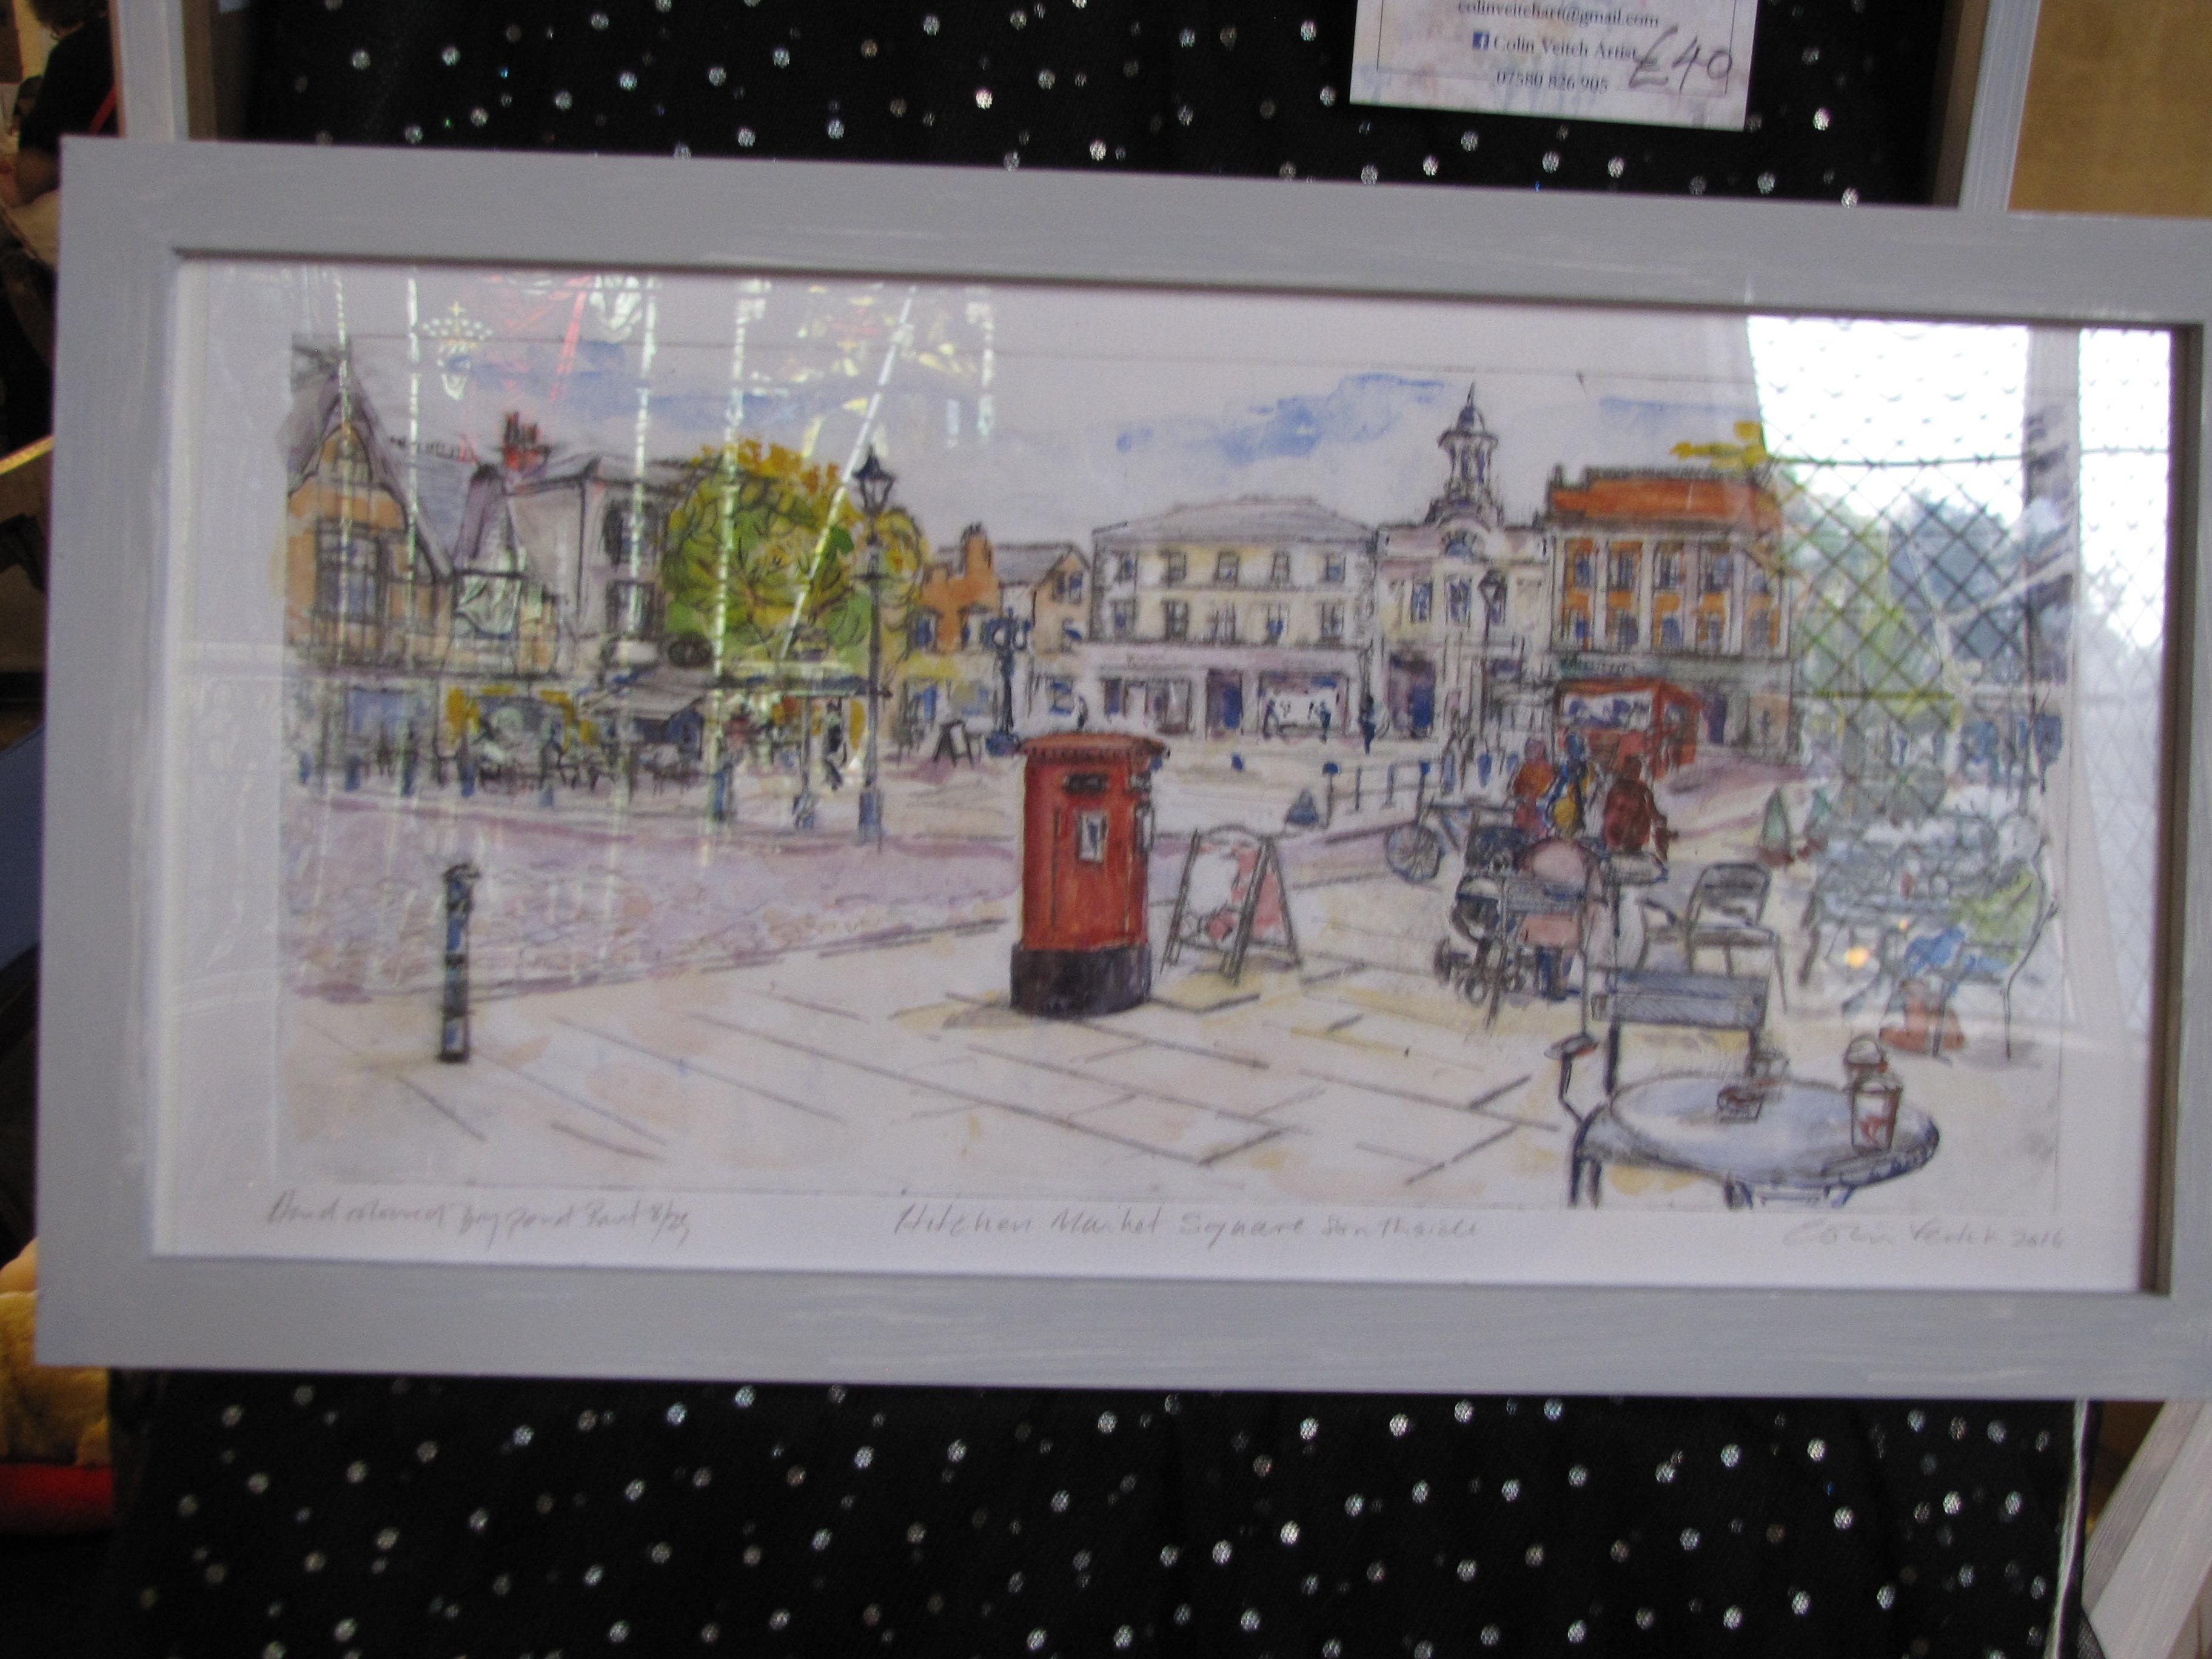 Southside Hitchin Market Square